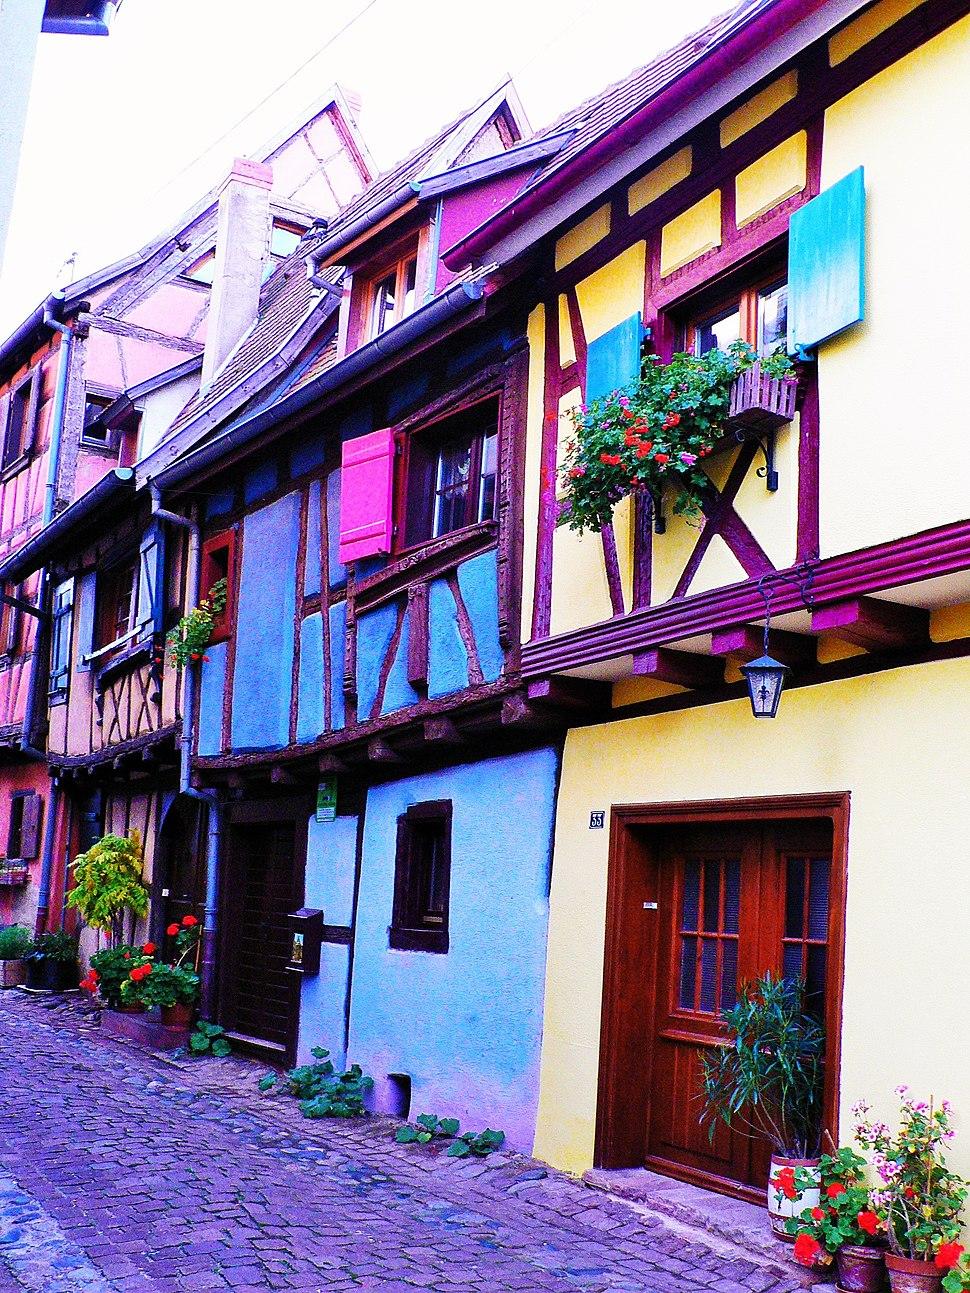 Eguisheim November 2010